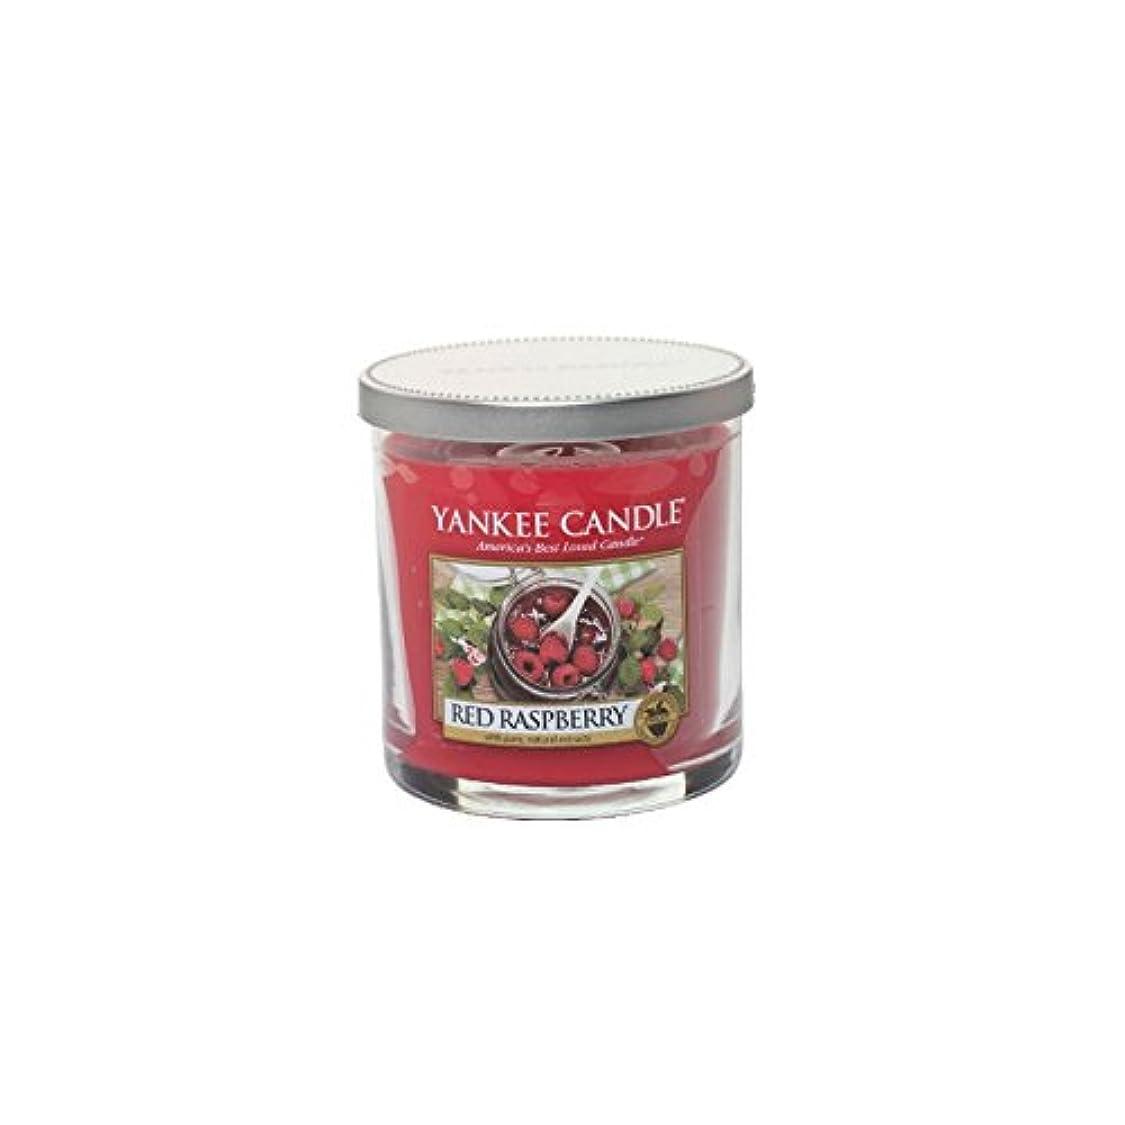 Yankee Candles Small Pillar Candle - Red Raspberry (Pack of 2) - ヤンキーキャンドルの小さな柱キャンドル - レッドラズベリー (x2) [並行輸入品]